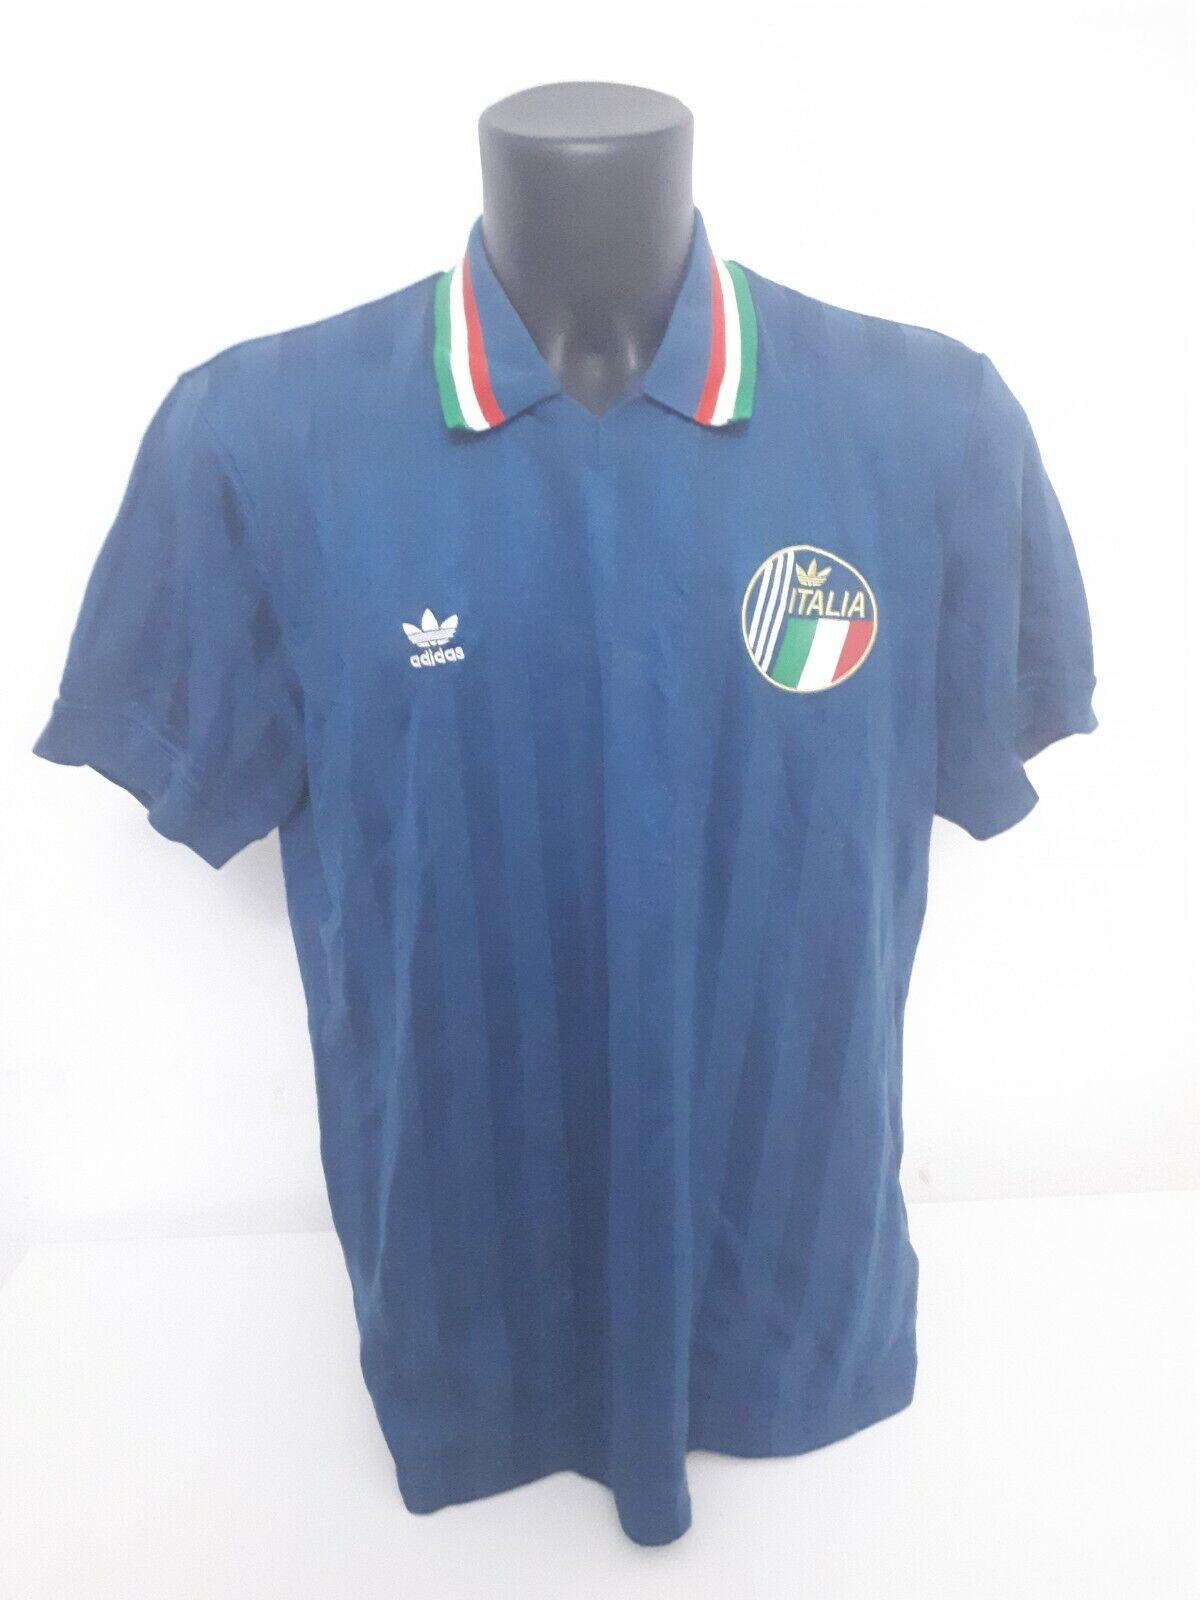 Camiseta Shirt Retro Vintage Futbol Seleccion Italiana talla xl